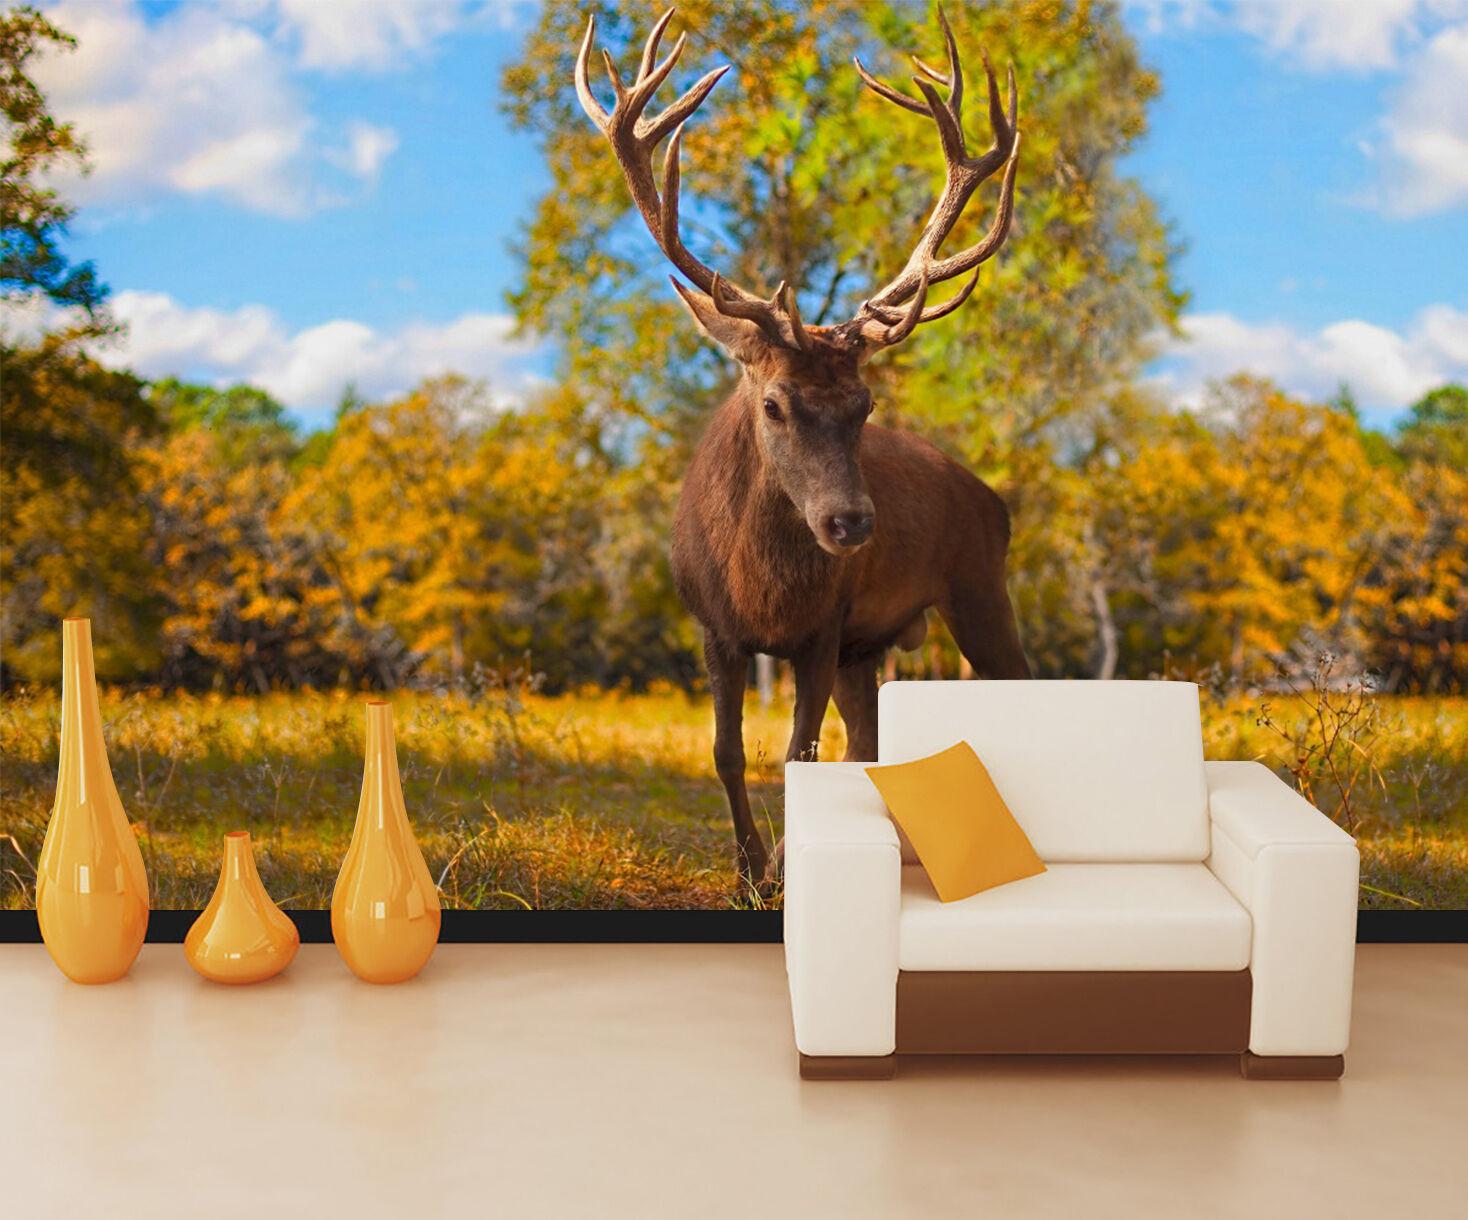 3D Pretty Wild Animal 1390 Wallpaper Decal Dercor Home Kids Nursery Mural Home